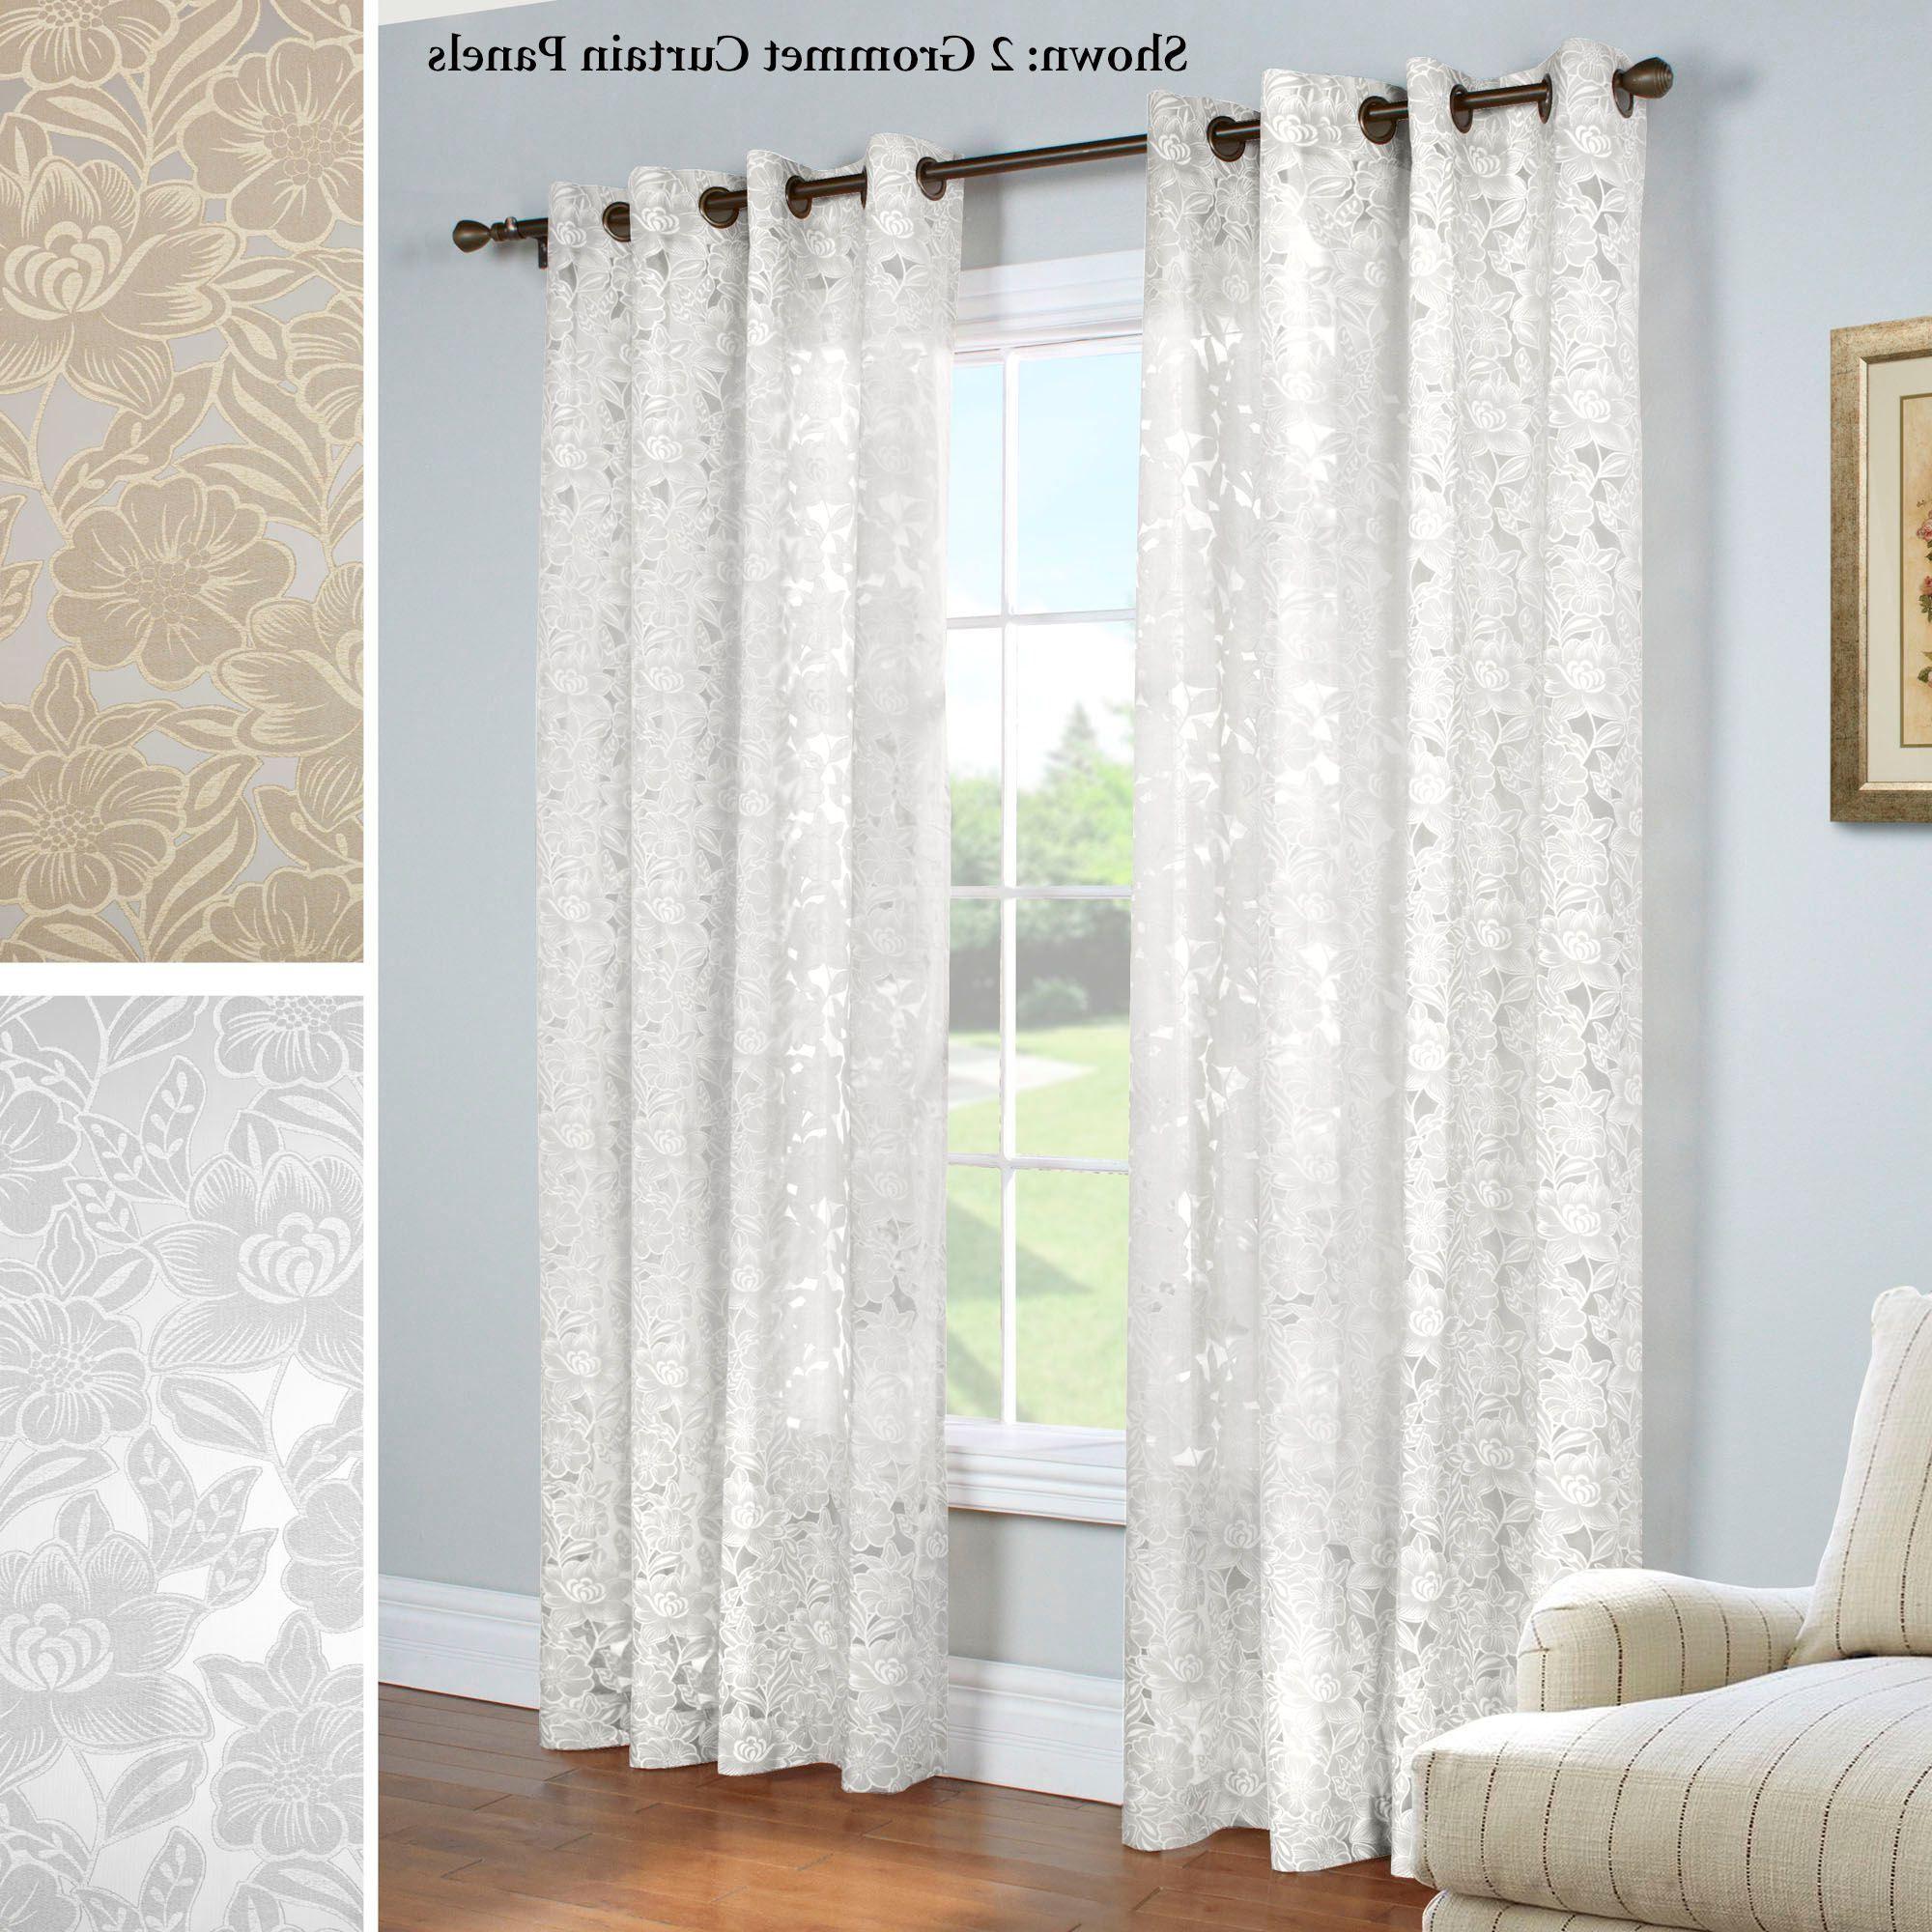 2020 Vina Sheer Bird Single Curtain Panels Within Carlotta Faux Burnout Semi Sheer Grommet Curtain Panel In (View 15 of 20)